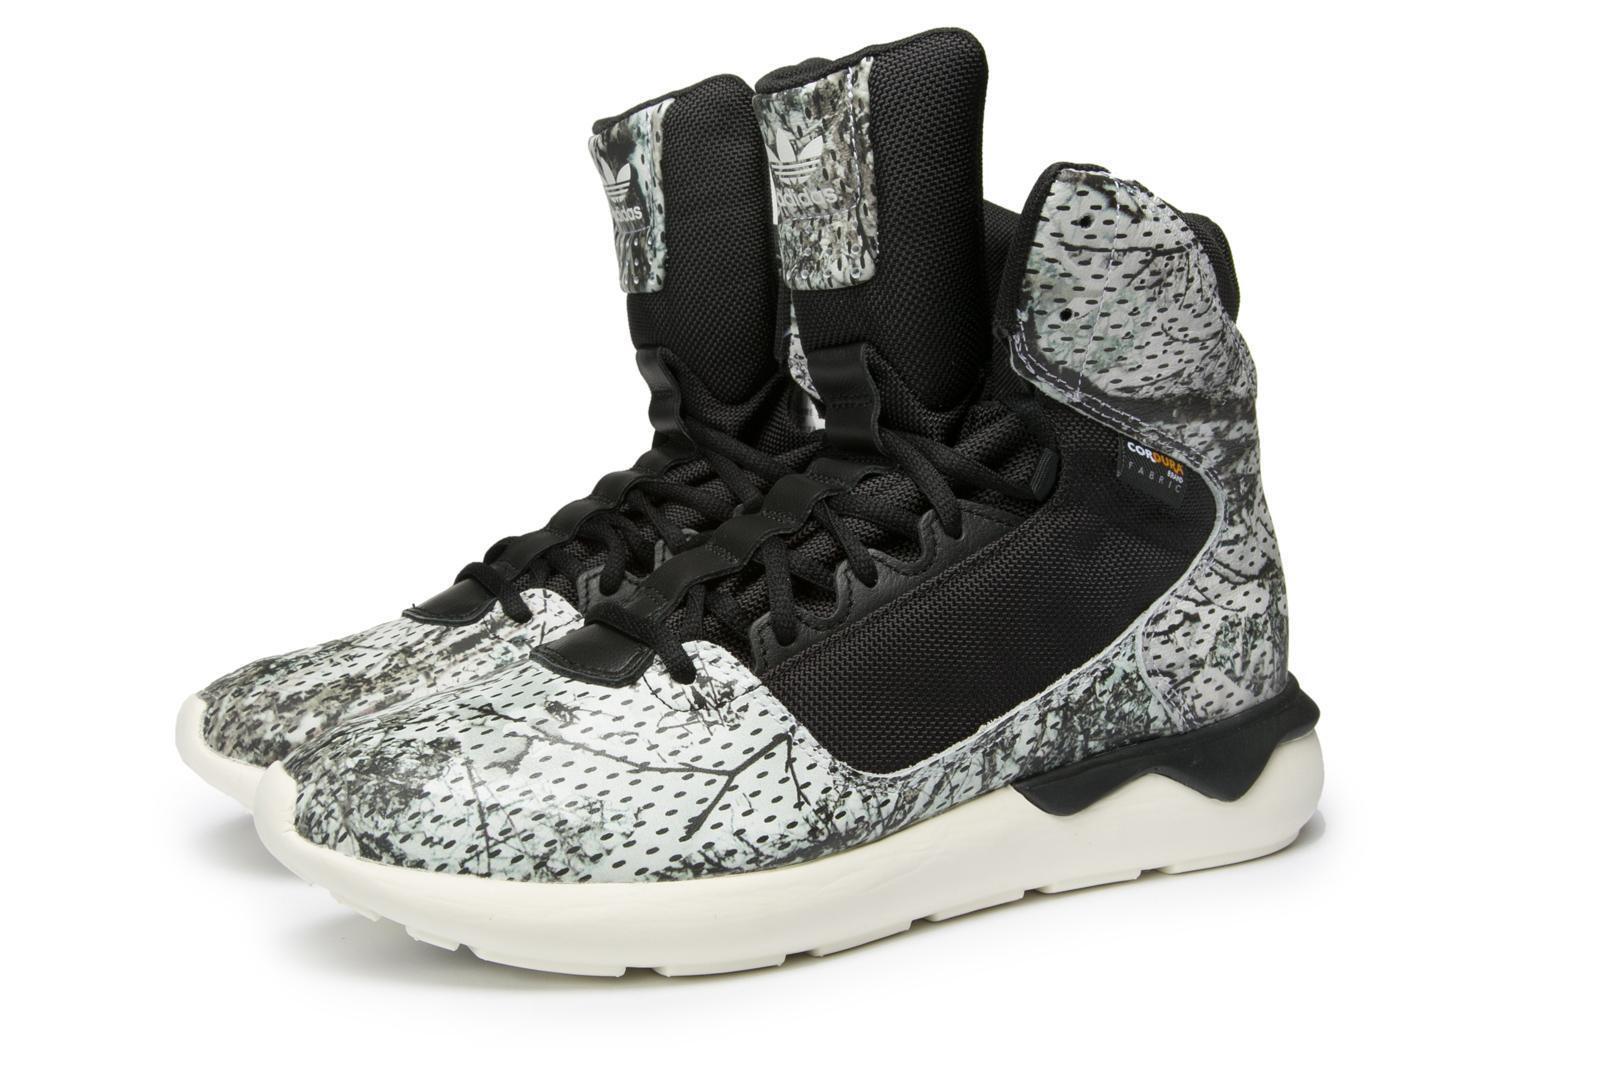 Adidas Originals Men's Tubular GSG9 Shoes Size 9.5 us S82515